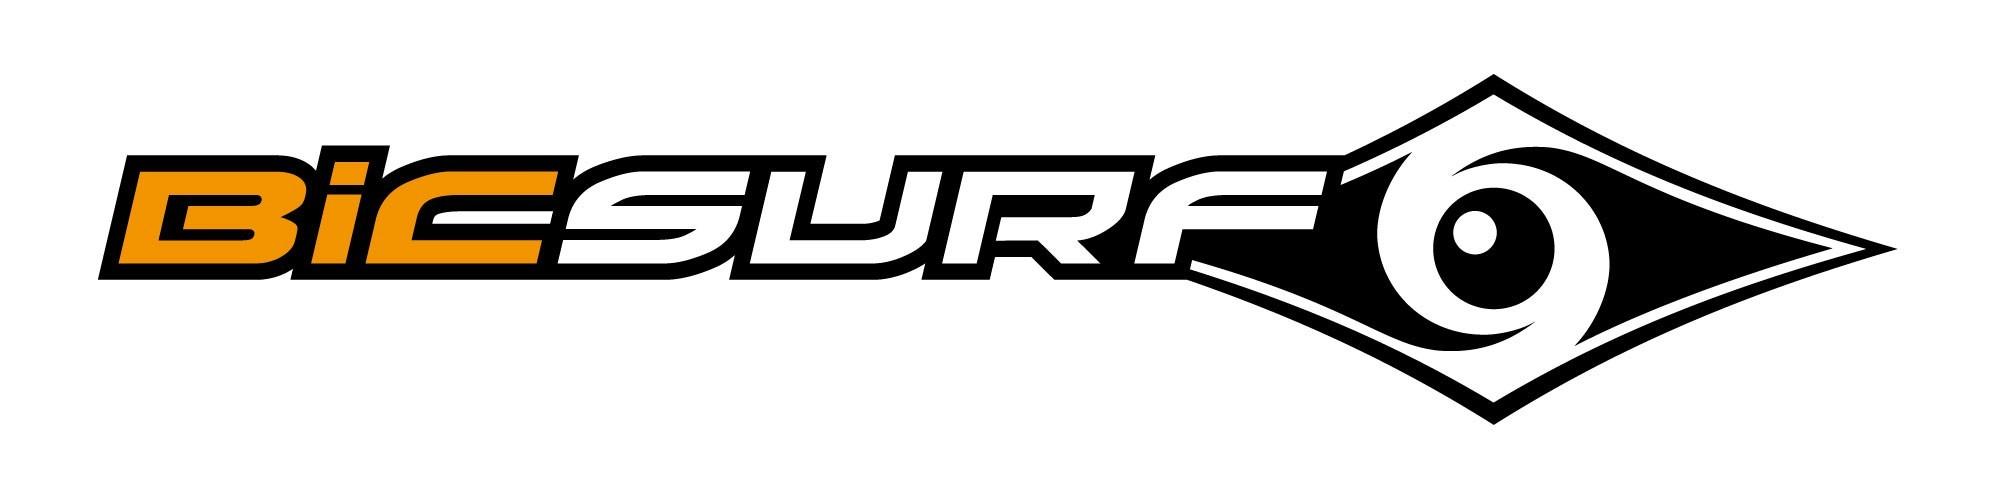 bic-surf-logodiamond-long-hr.jpg